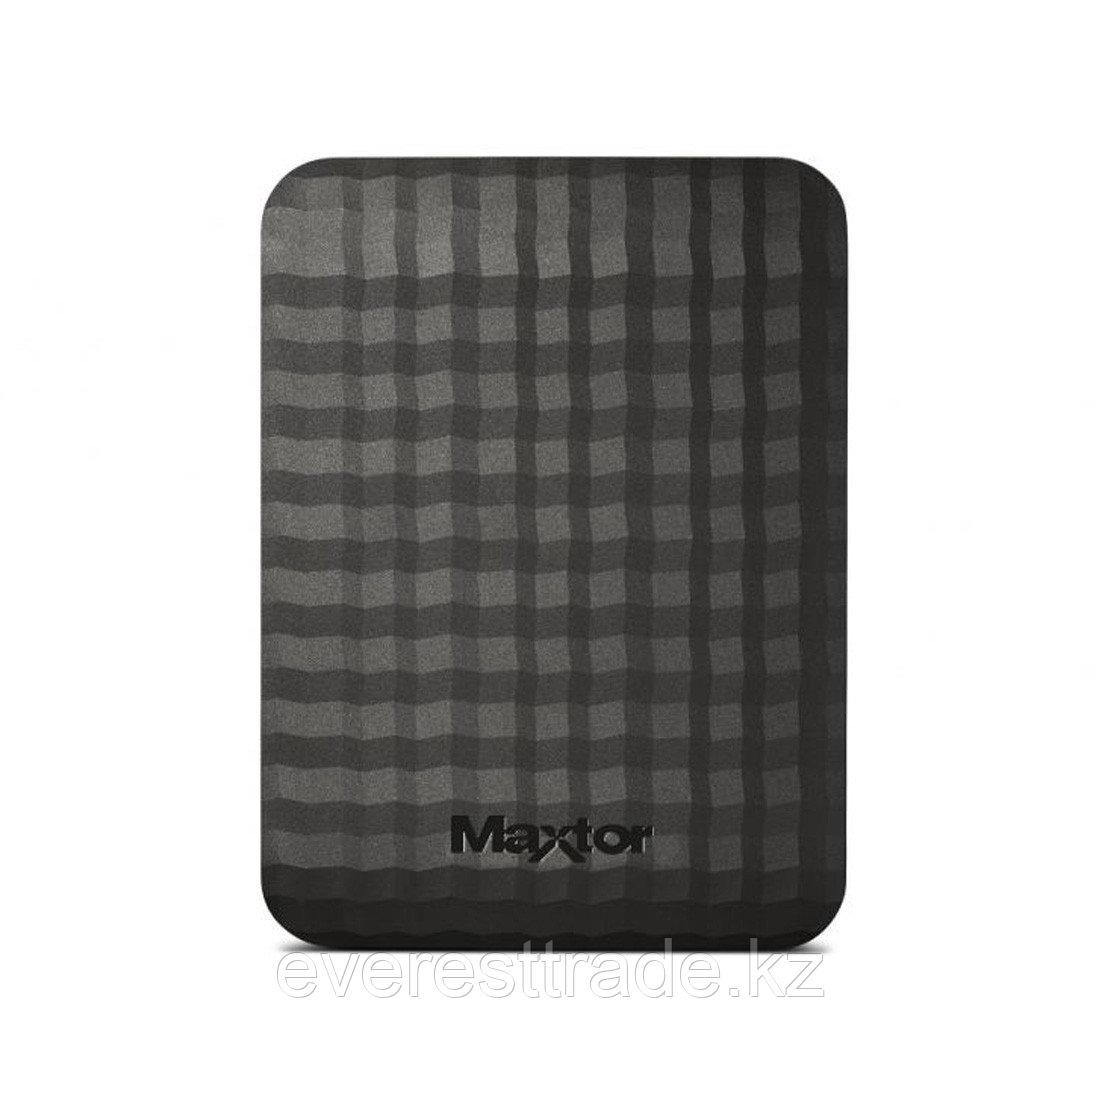 "Внешний жёсткий диск Seagate (Maxtor) 500GB 2.5"" STSHX-M500TCBM USB 3.0"